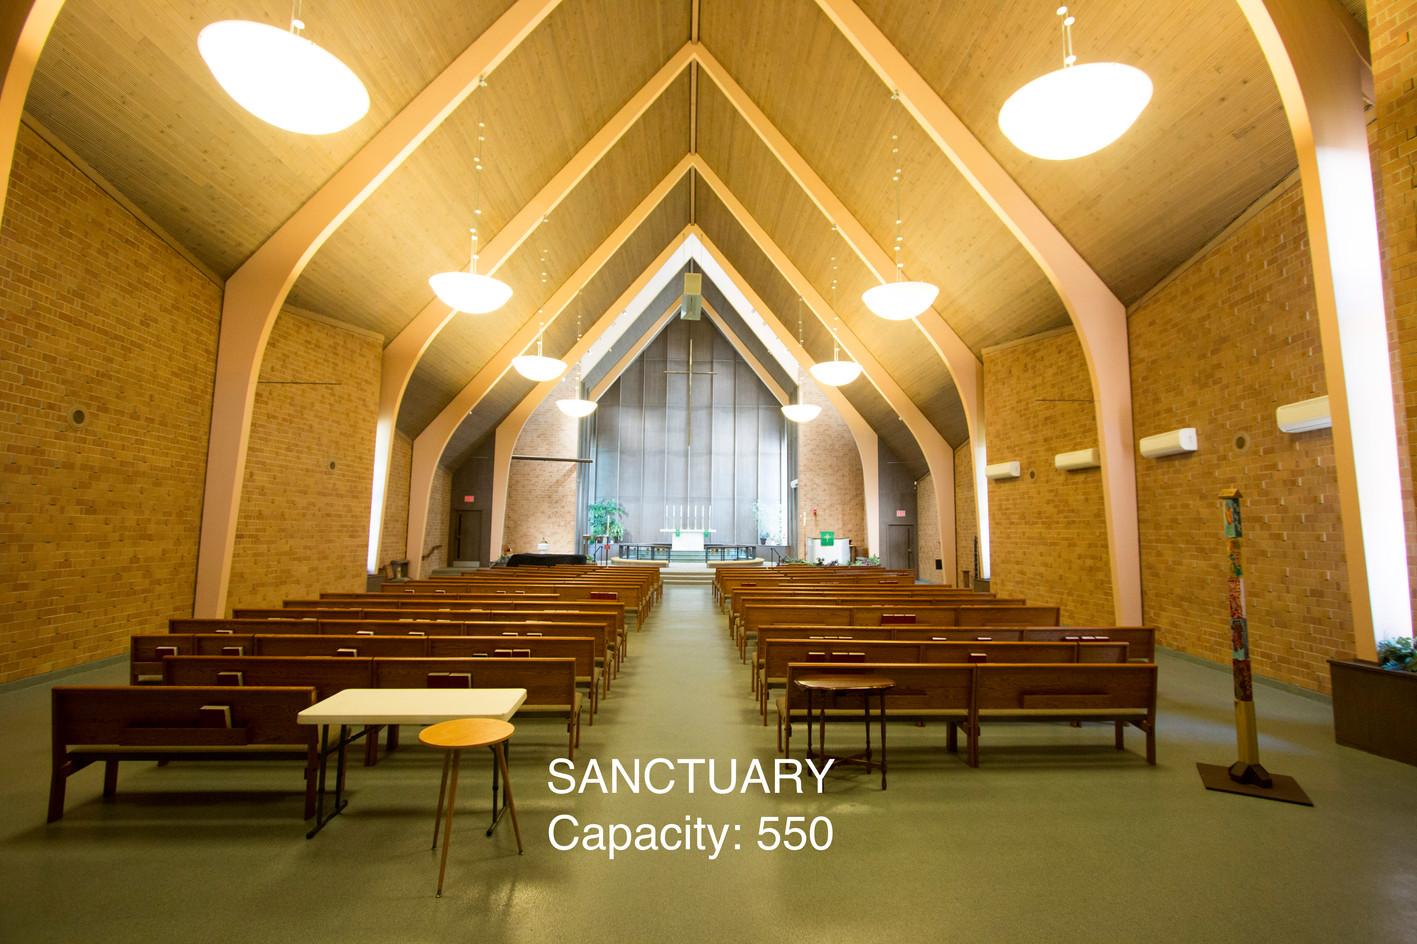 Sanctuary2.jpg